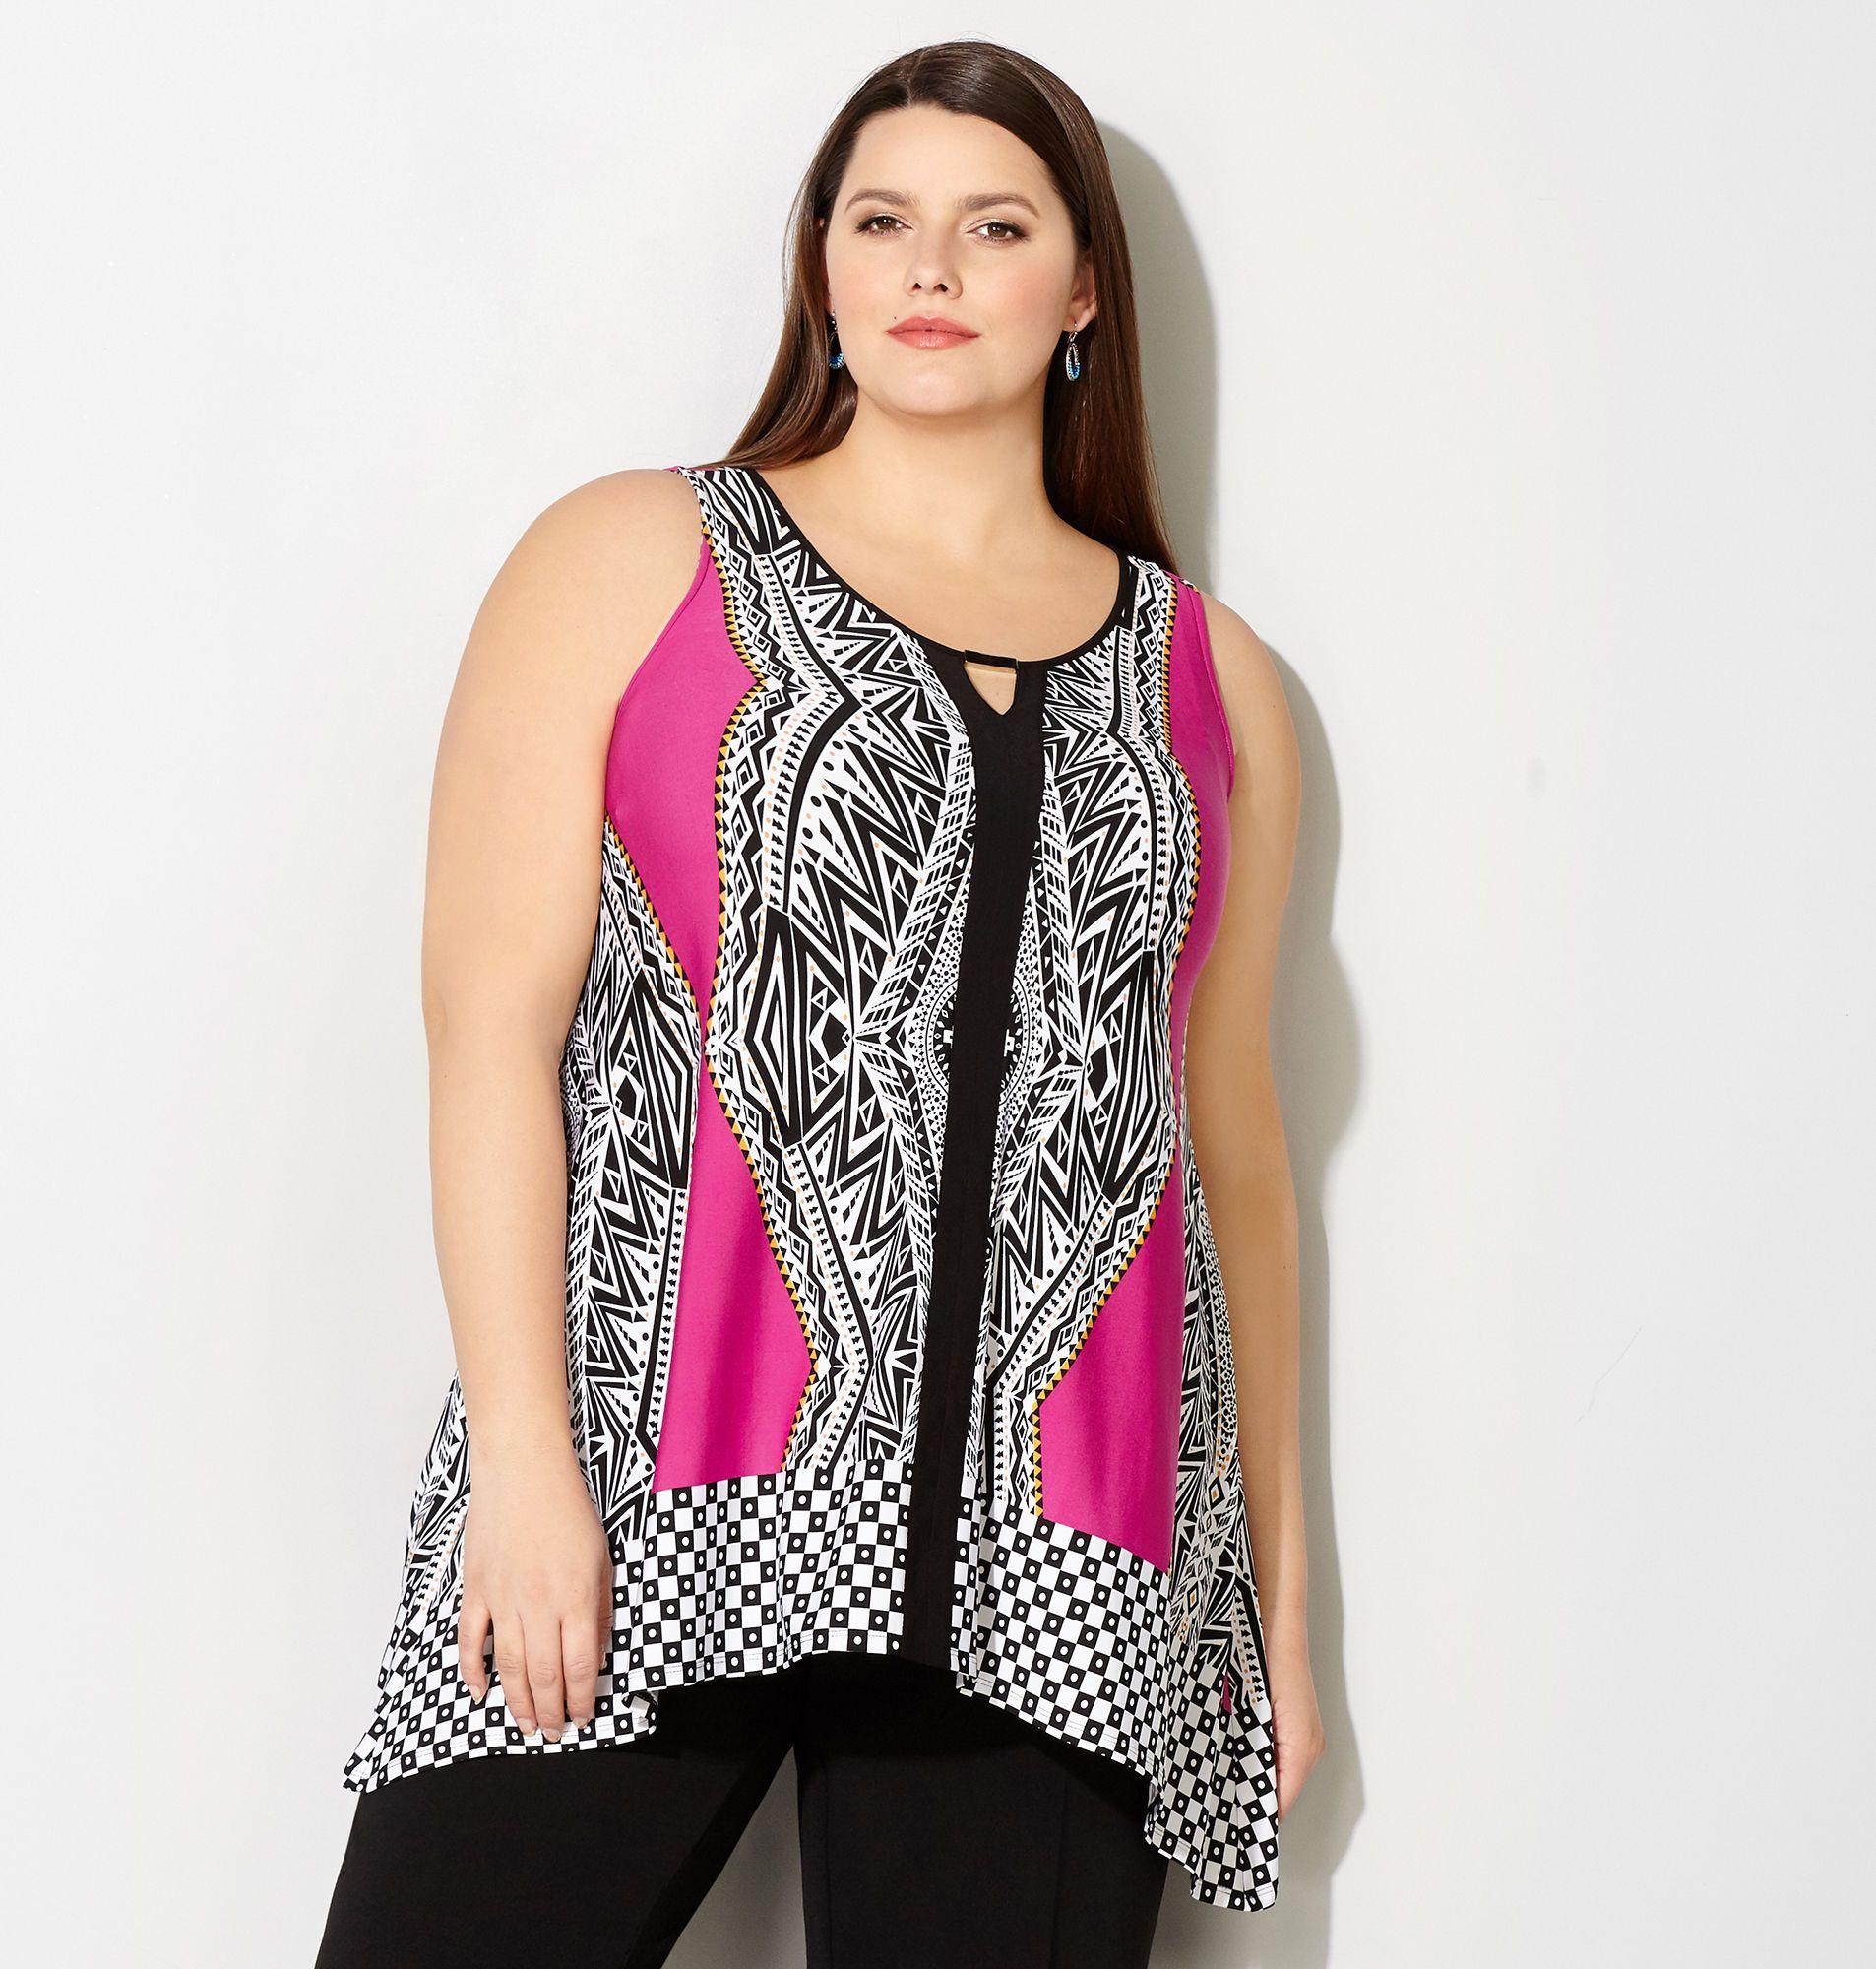 708e9aac1b503 Tribal Bar Sharkbite Tank - Avenue · I Love FashionPlus Size ClothingBright  ColoursSize ...